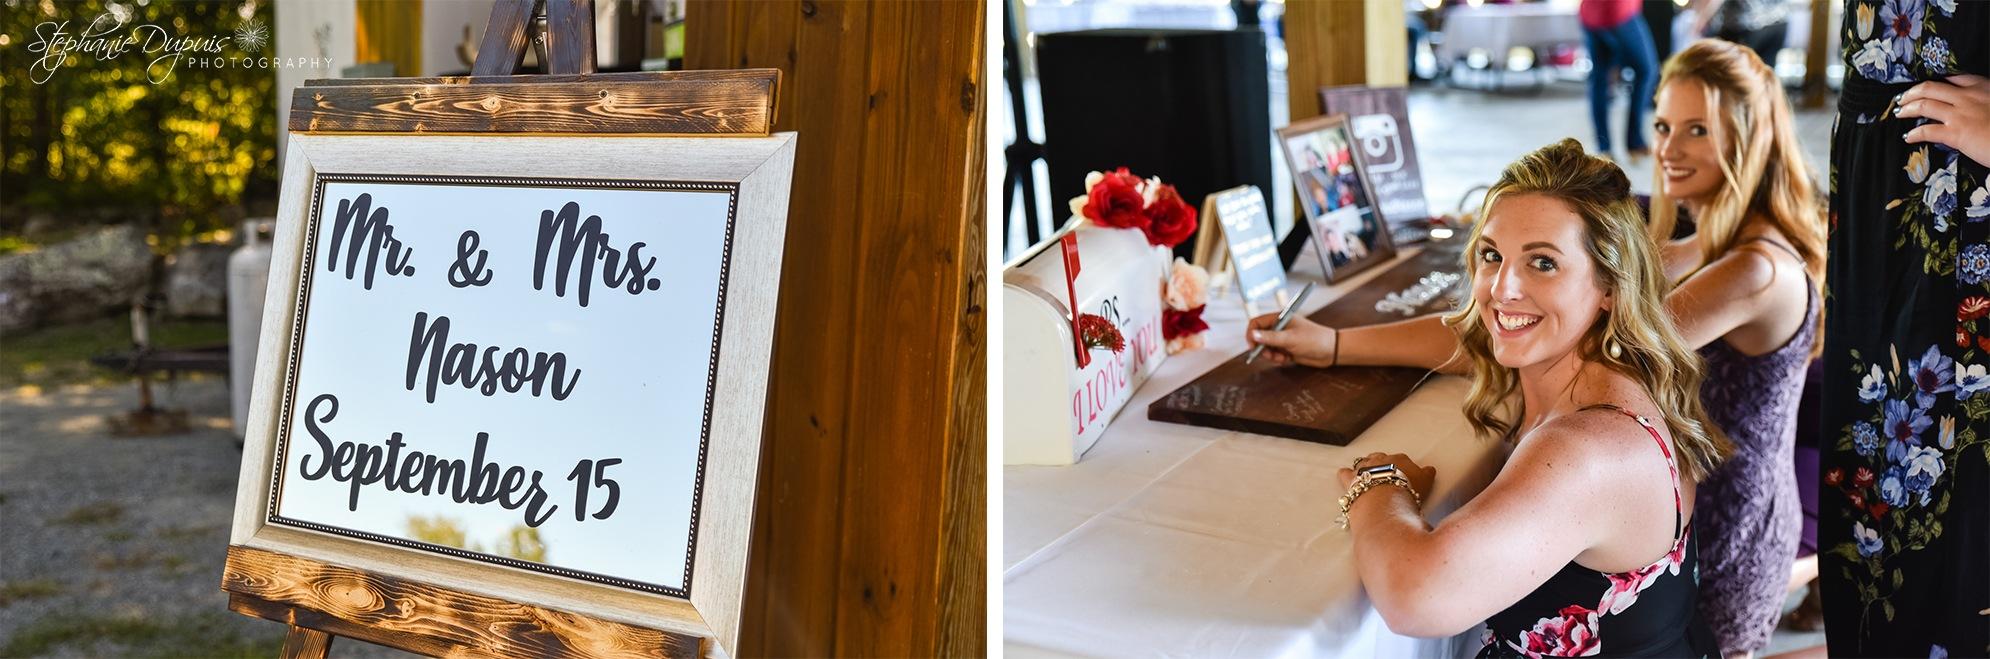 Whitefield Wedding Photographer 03 2 - Portfolio: Brown Wedding